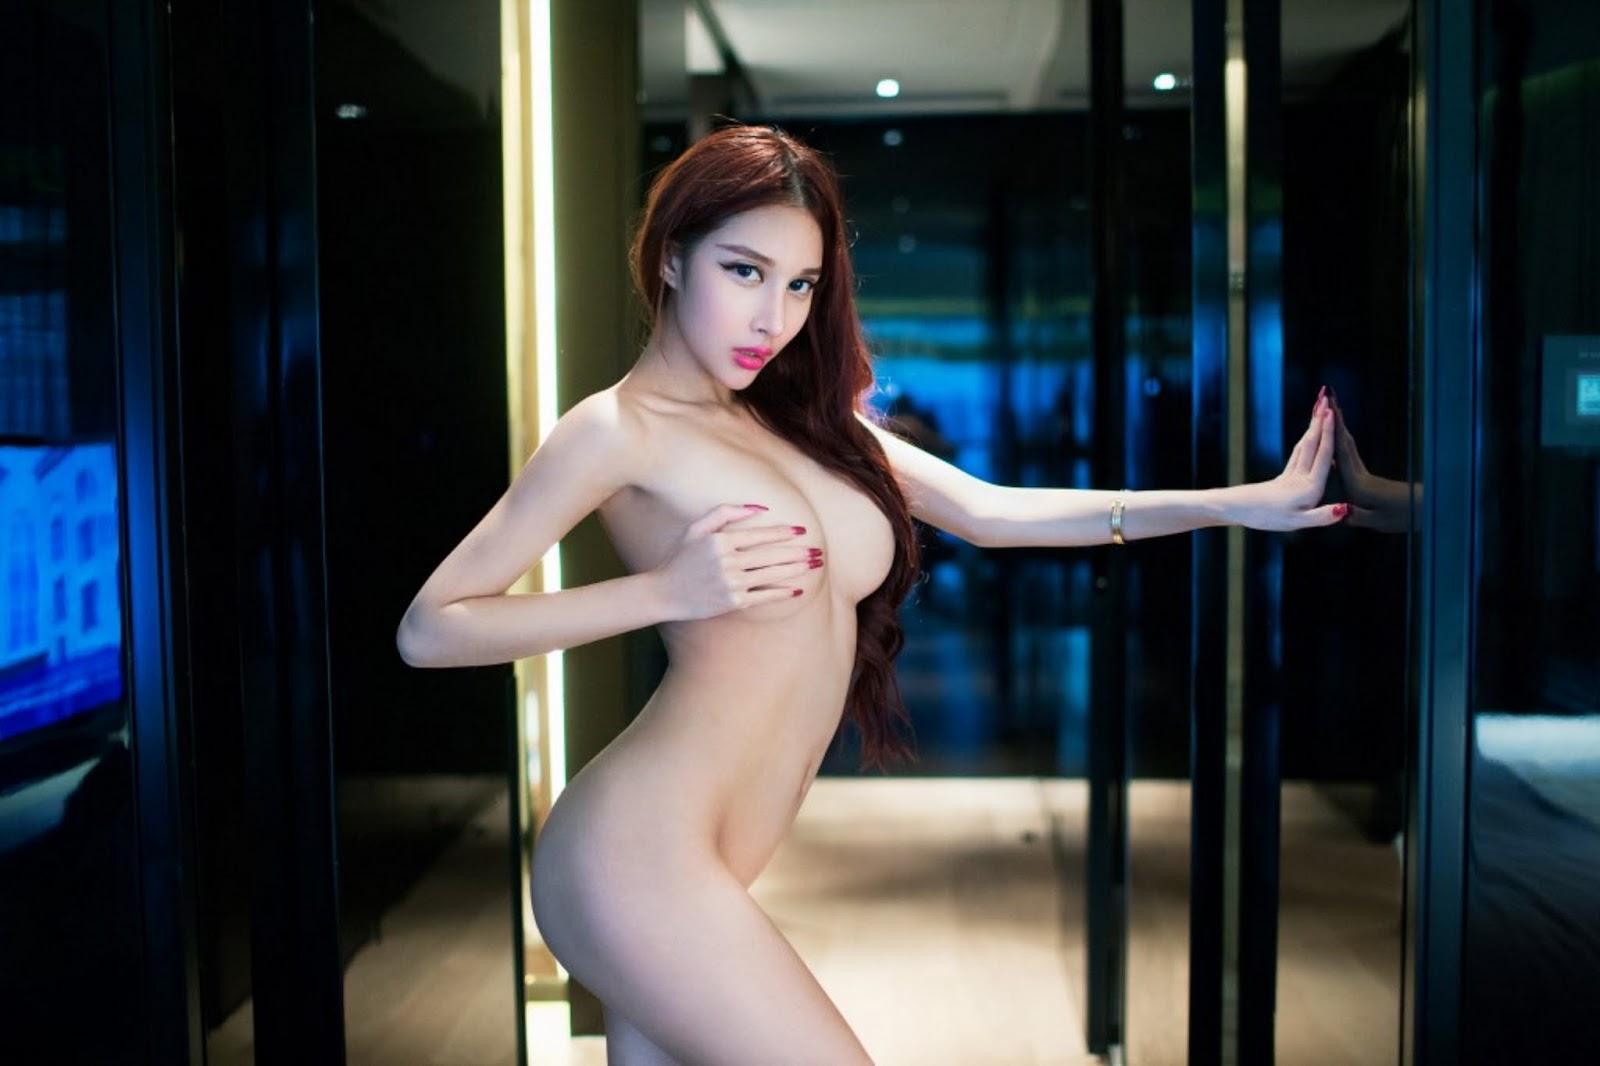 %25C2%25B1 %25C2%25B1 38 - Model Nude TUIGIRL NO.49 Beauty Body Tits